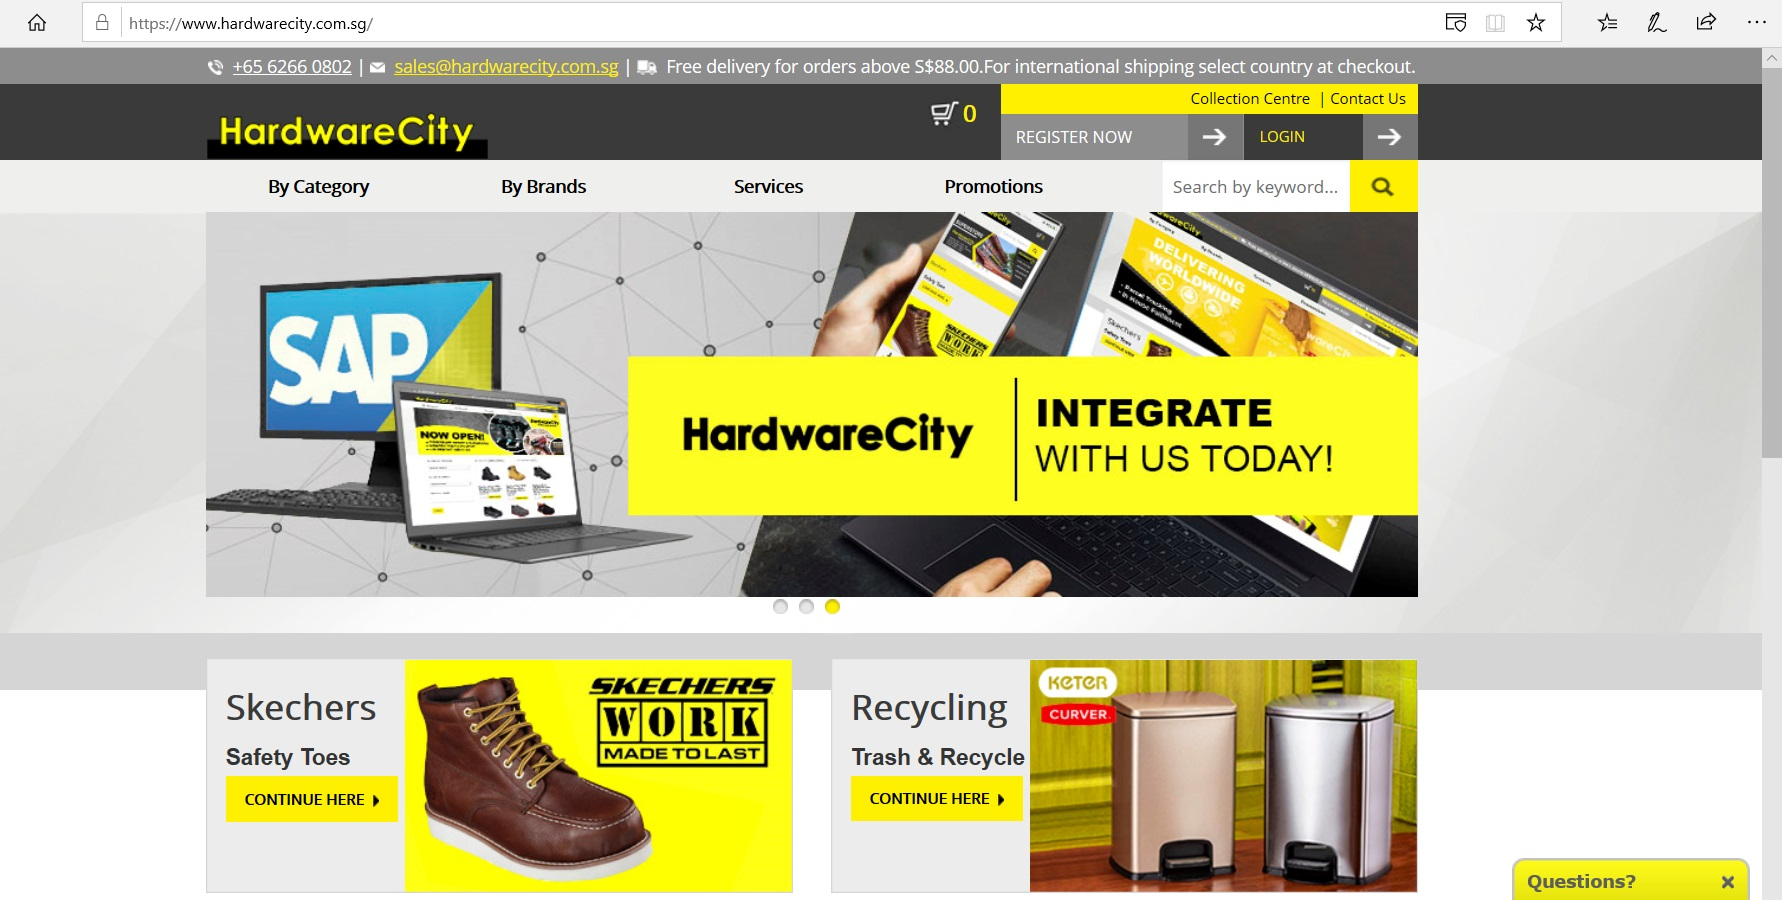 Hardware City website homepage.